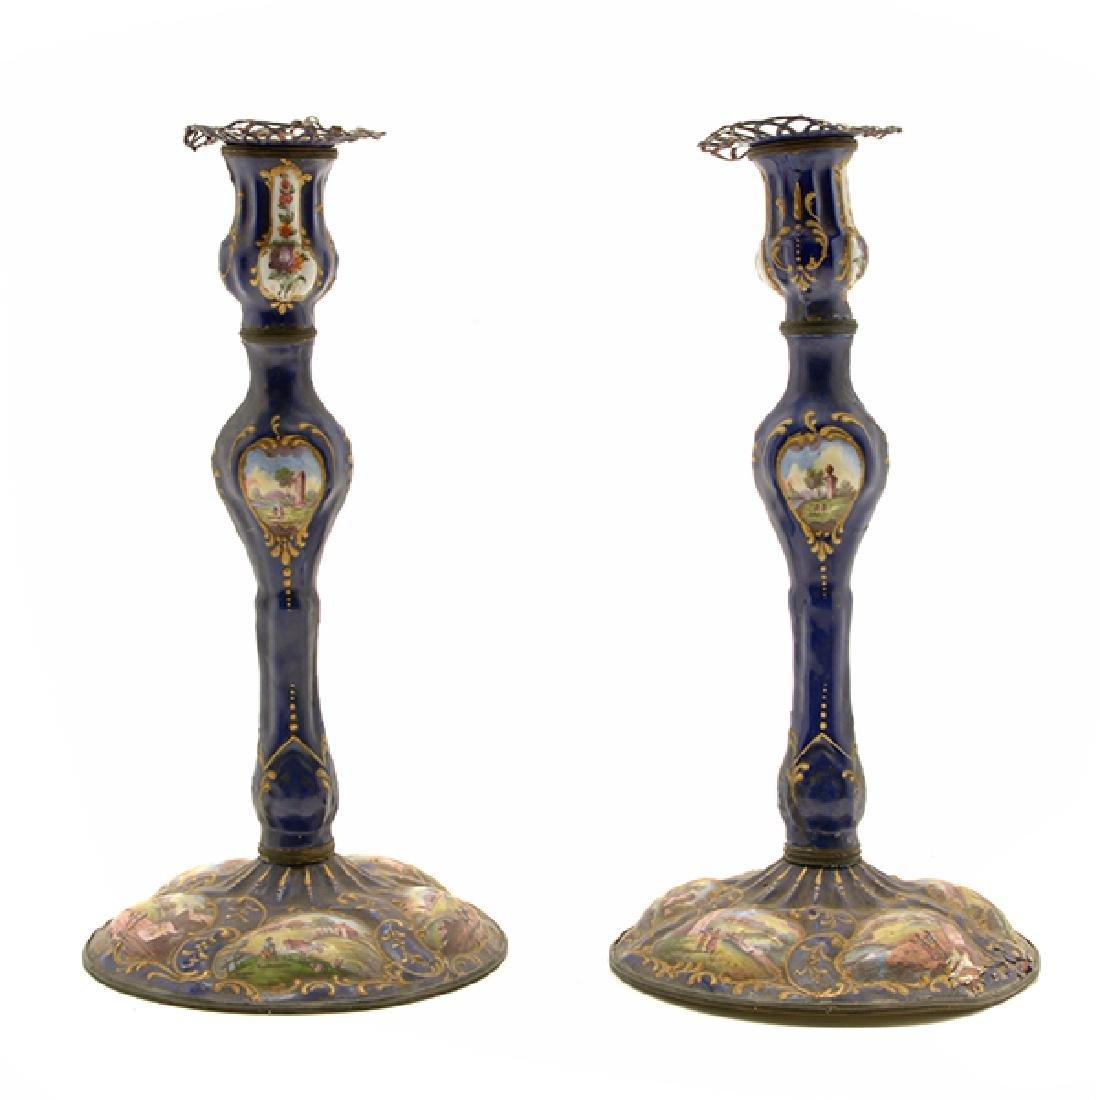 Pair of Limoges Enamel Candlesticks